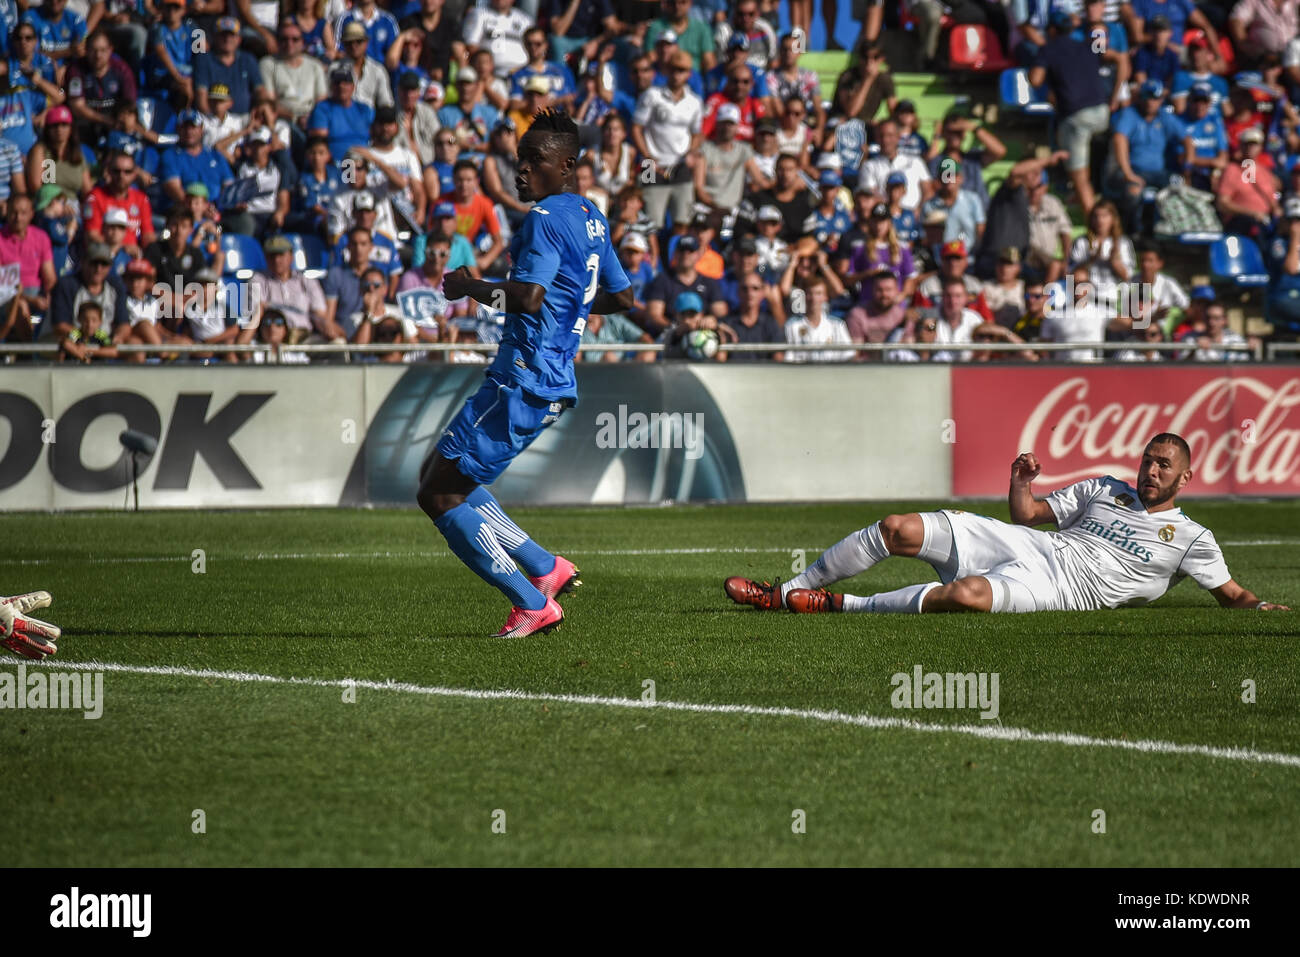 Real Madrid Vs Getafe La Liga 2013 Brilliant Second: Real Madrid Football Stock Photos & Real Madrid Football